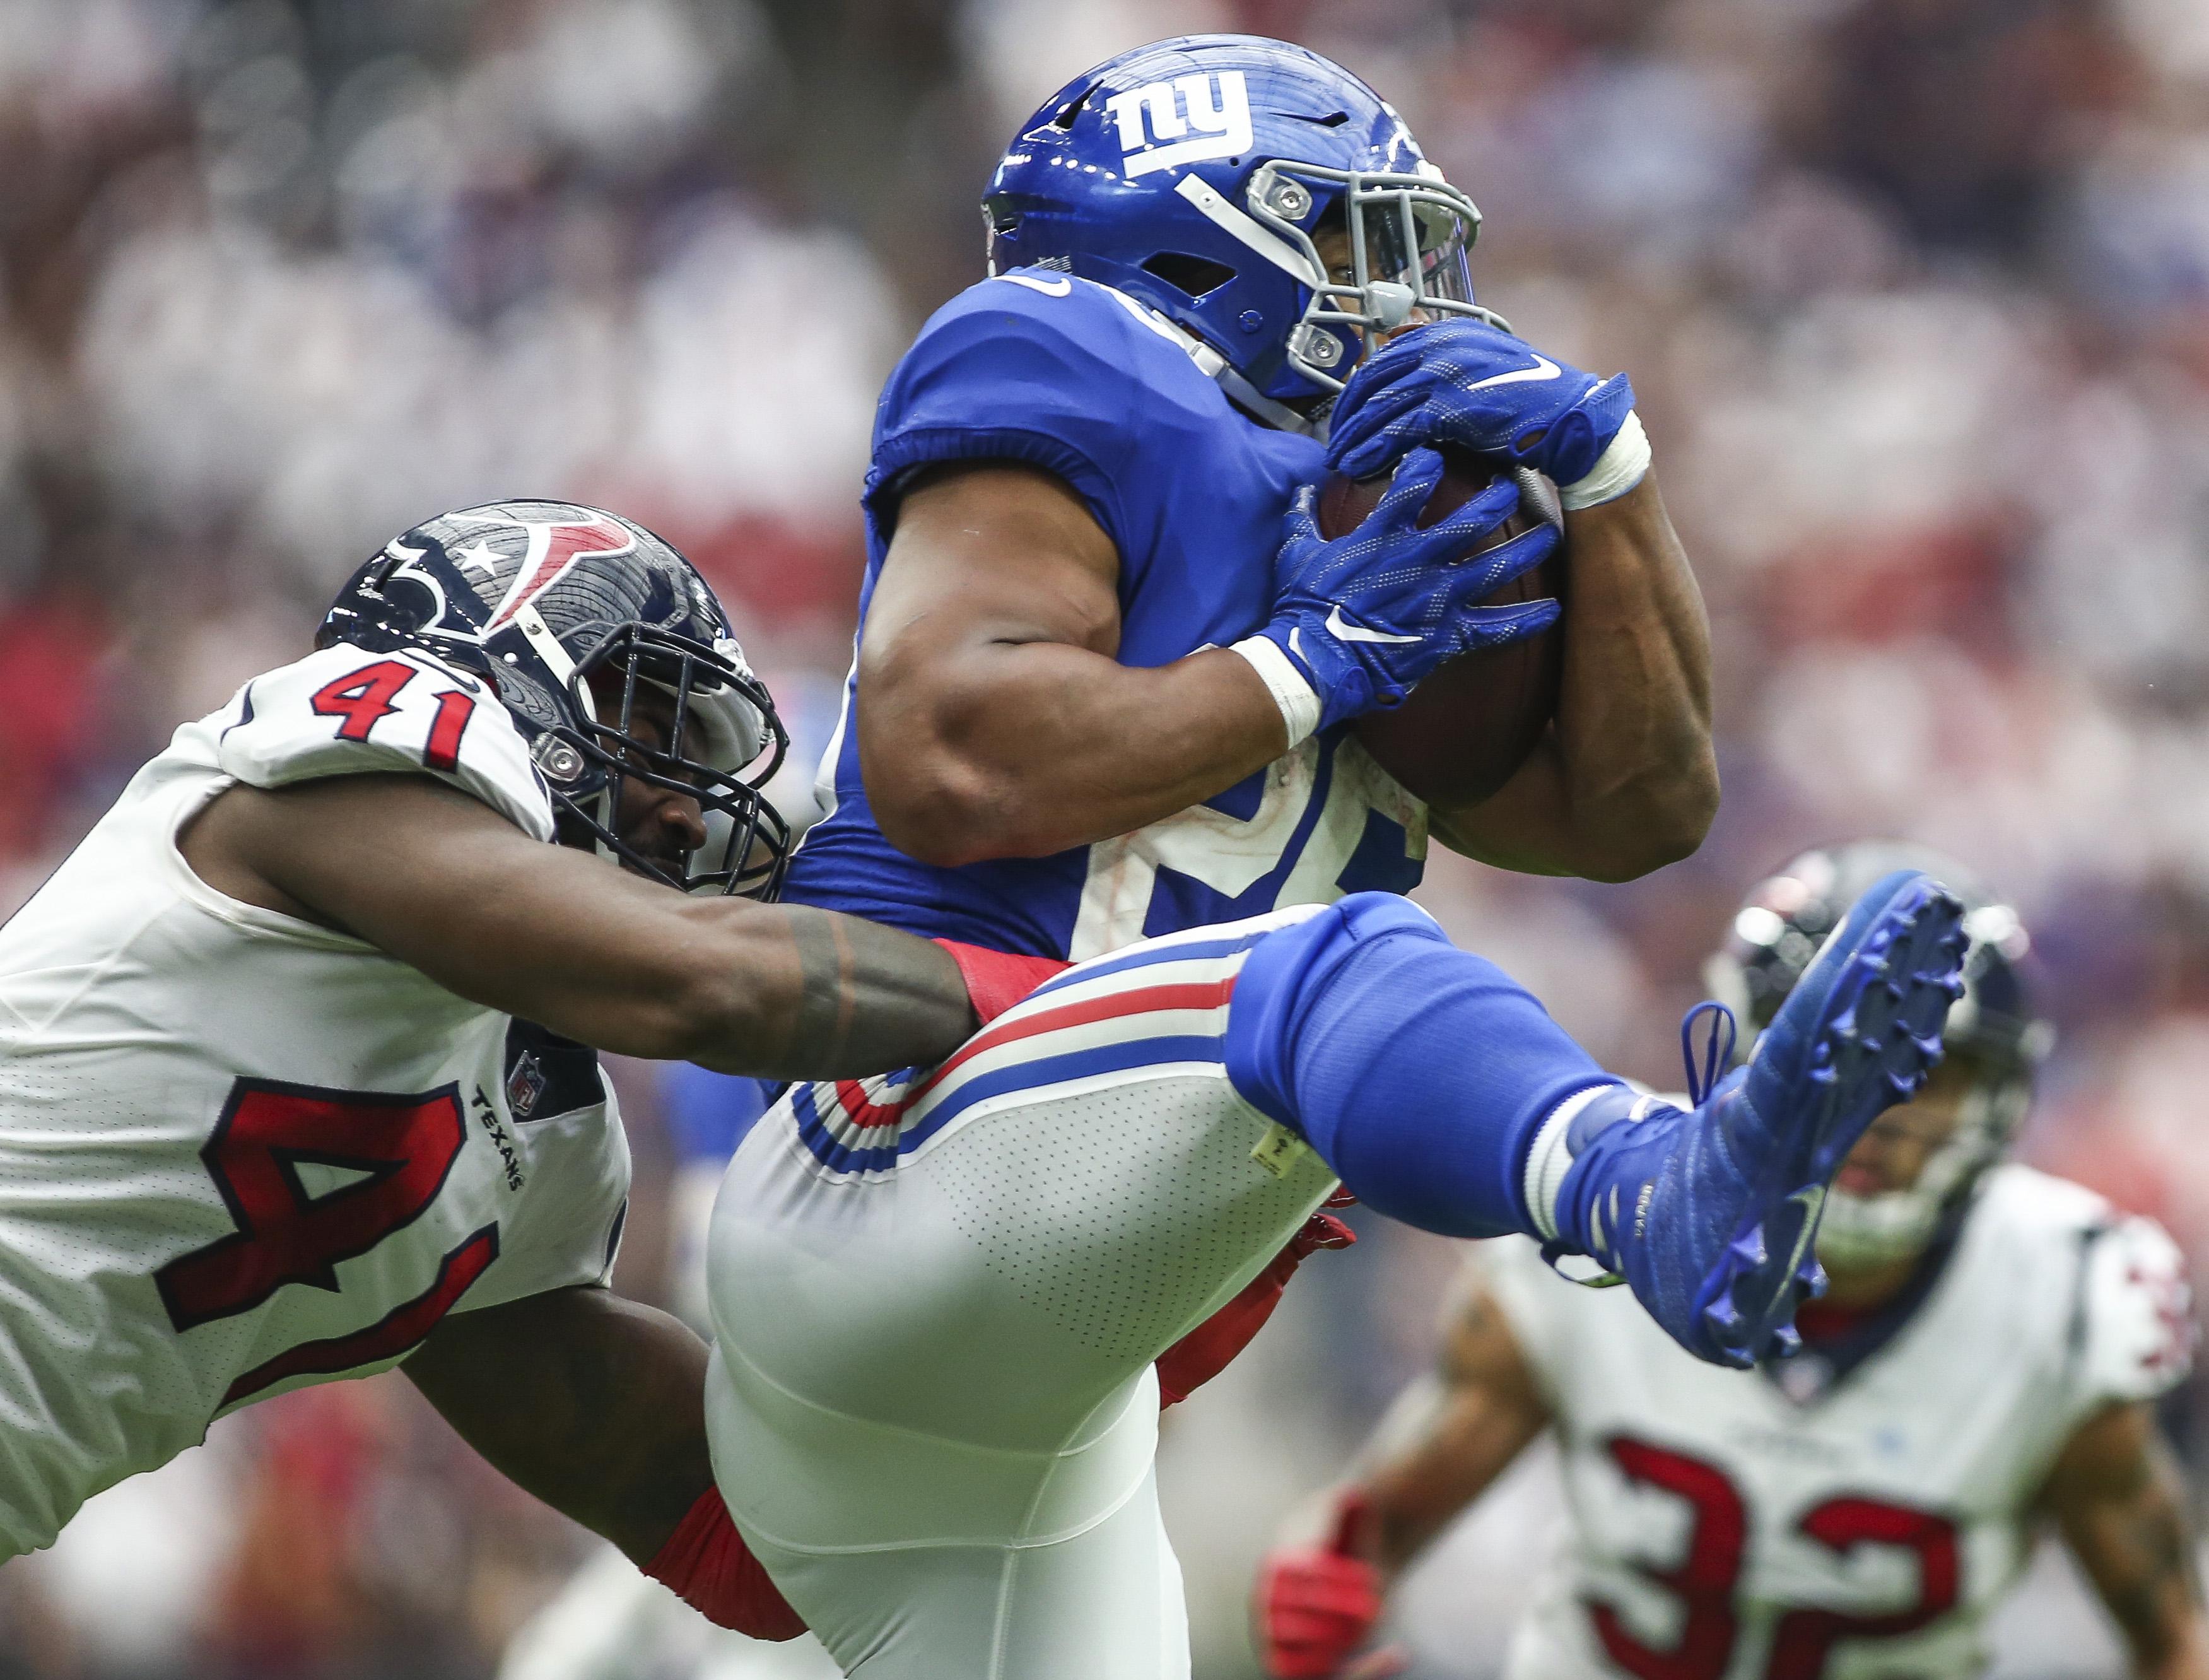 NFL: New York Giants at Houston Texans